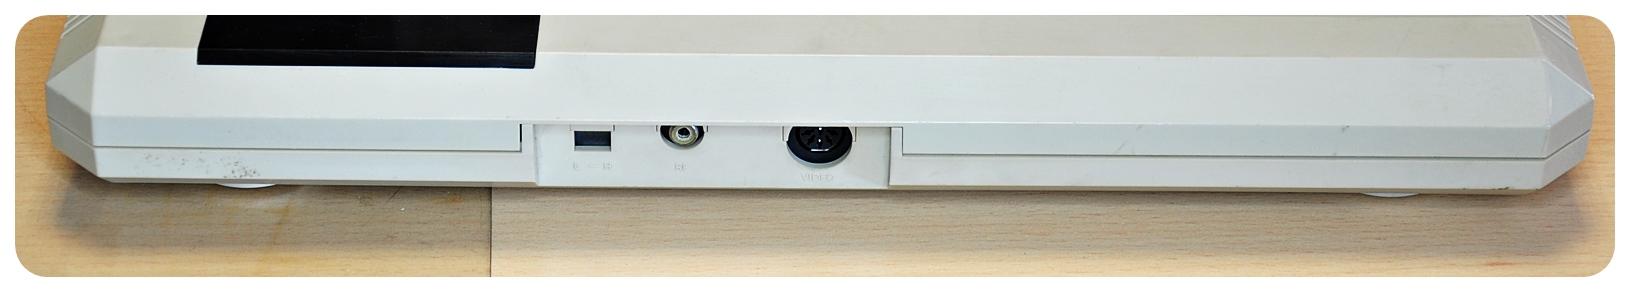 konsola COMMODORE C 64GS - ładny komplet ! - 7369307703